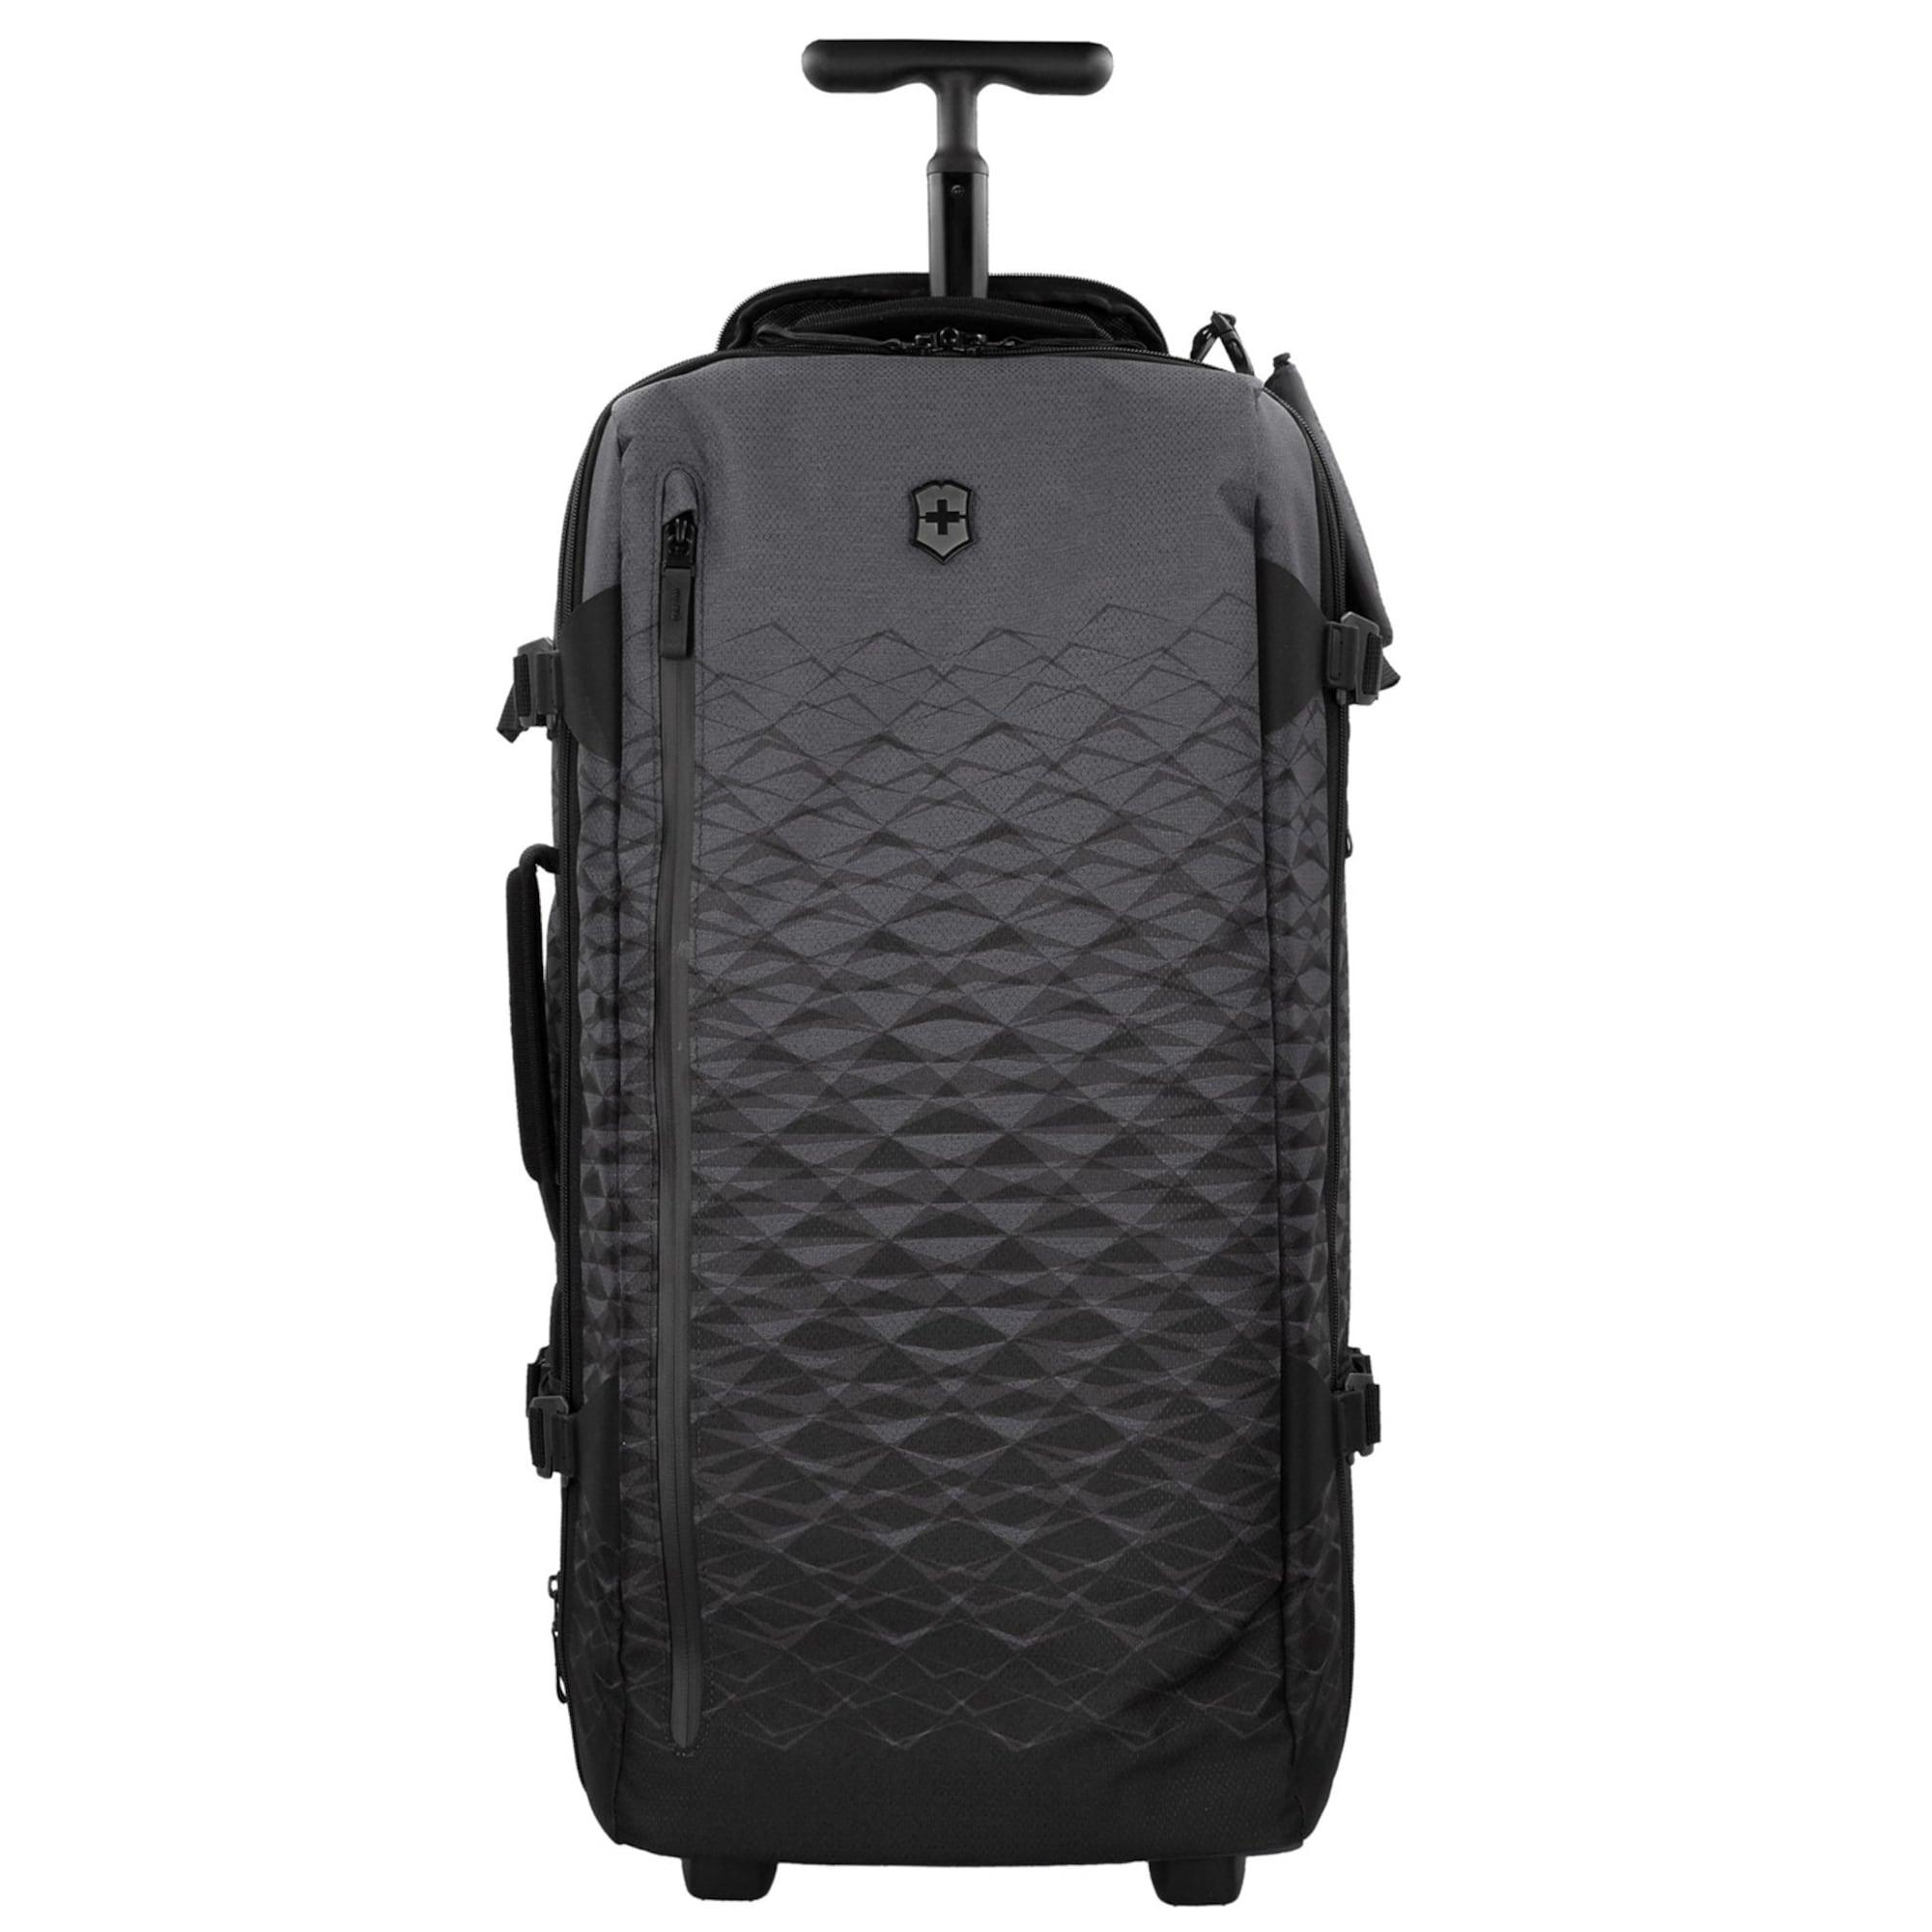 Trolley | Taschen > Koffer & Trolleys > Trolleys | Victorinox